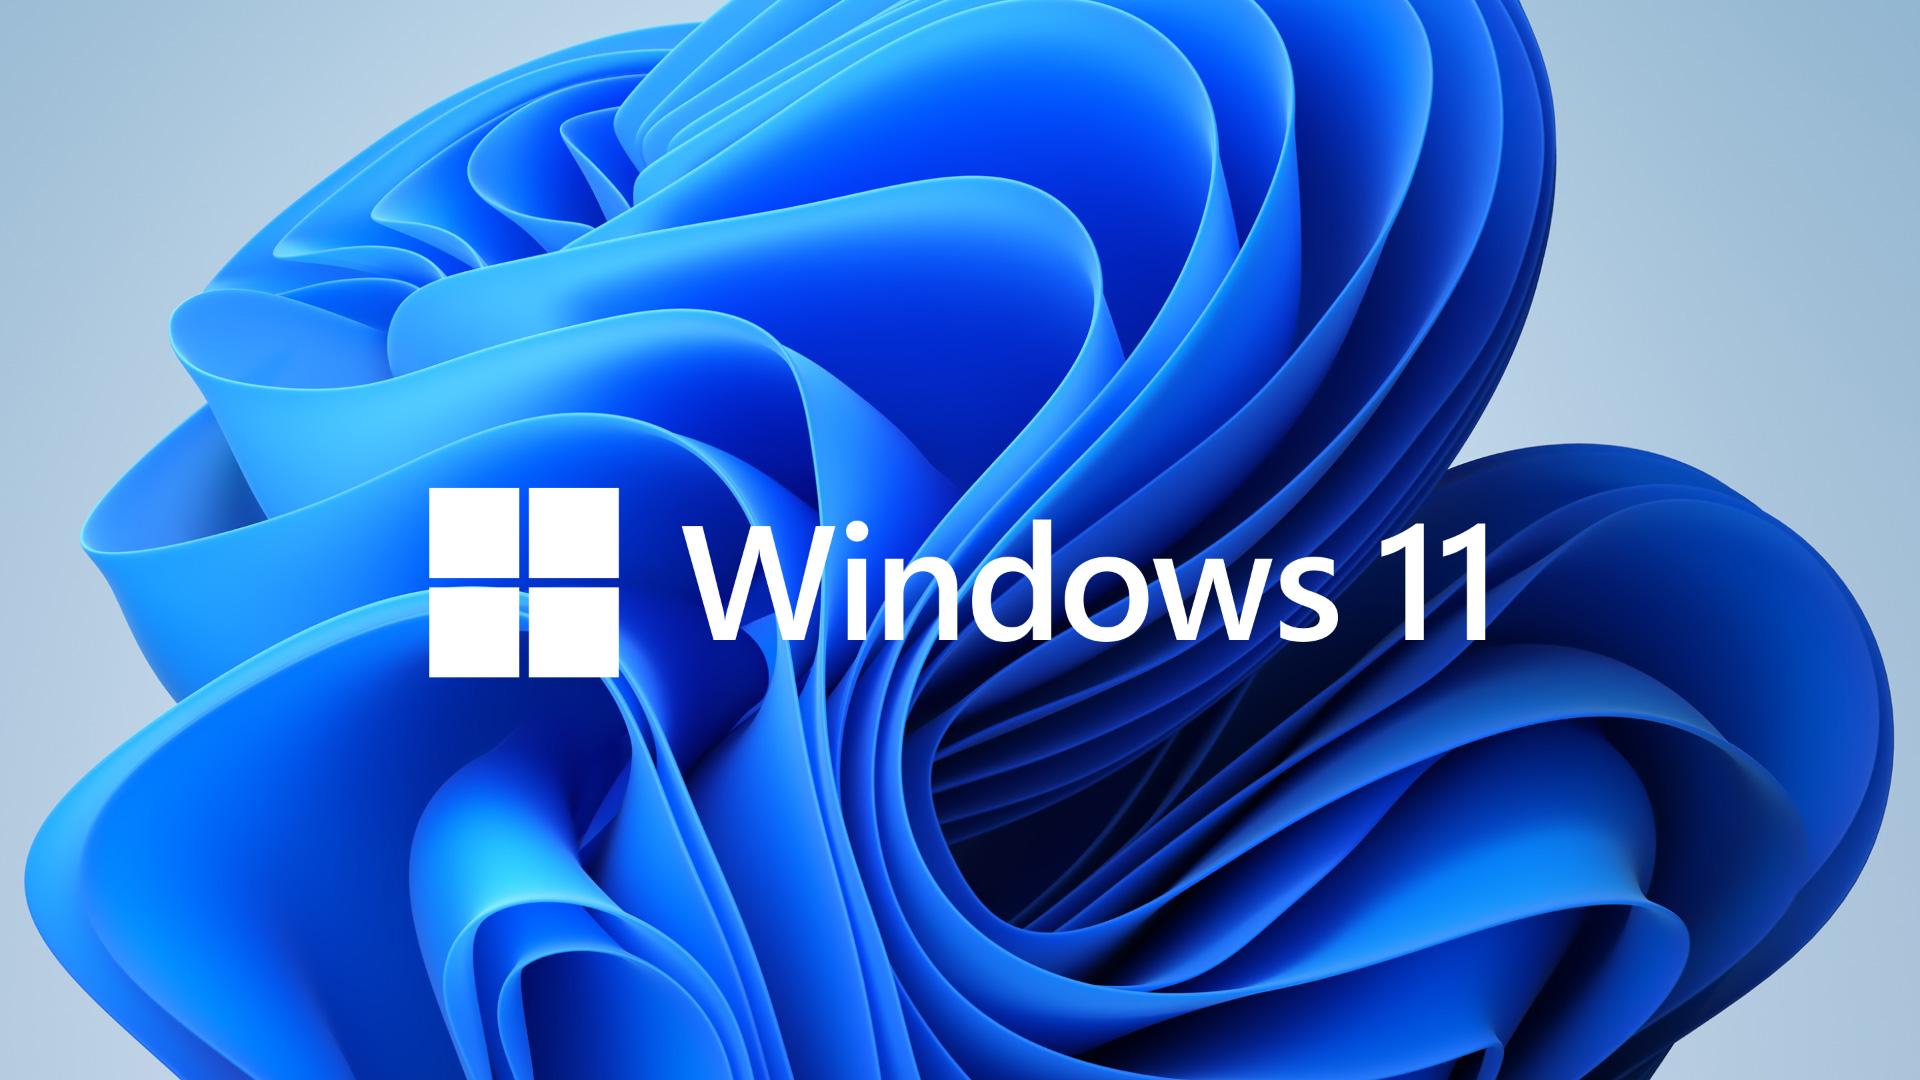 Windows 11-logotyp och dekorativ bakgrund